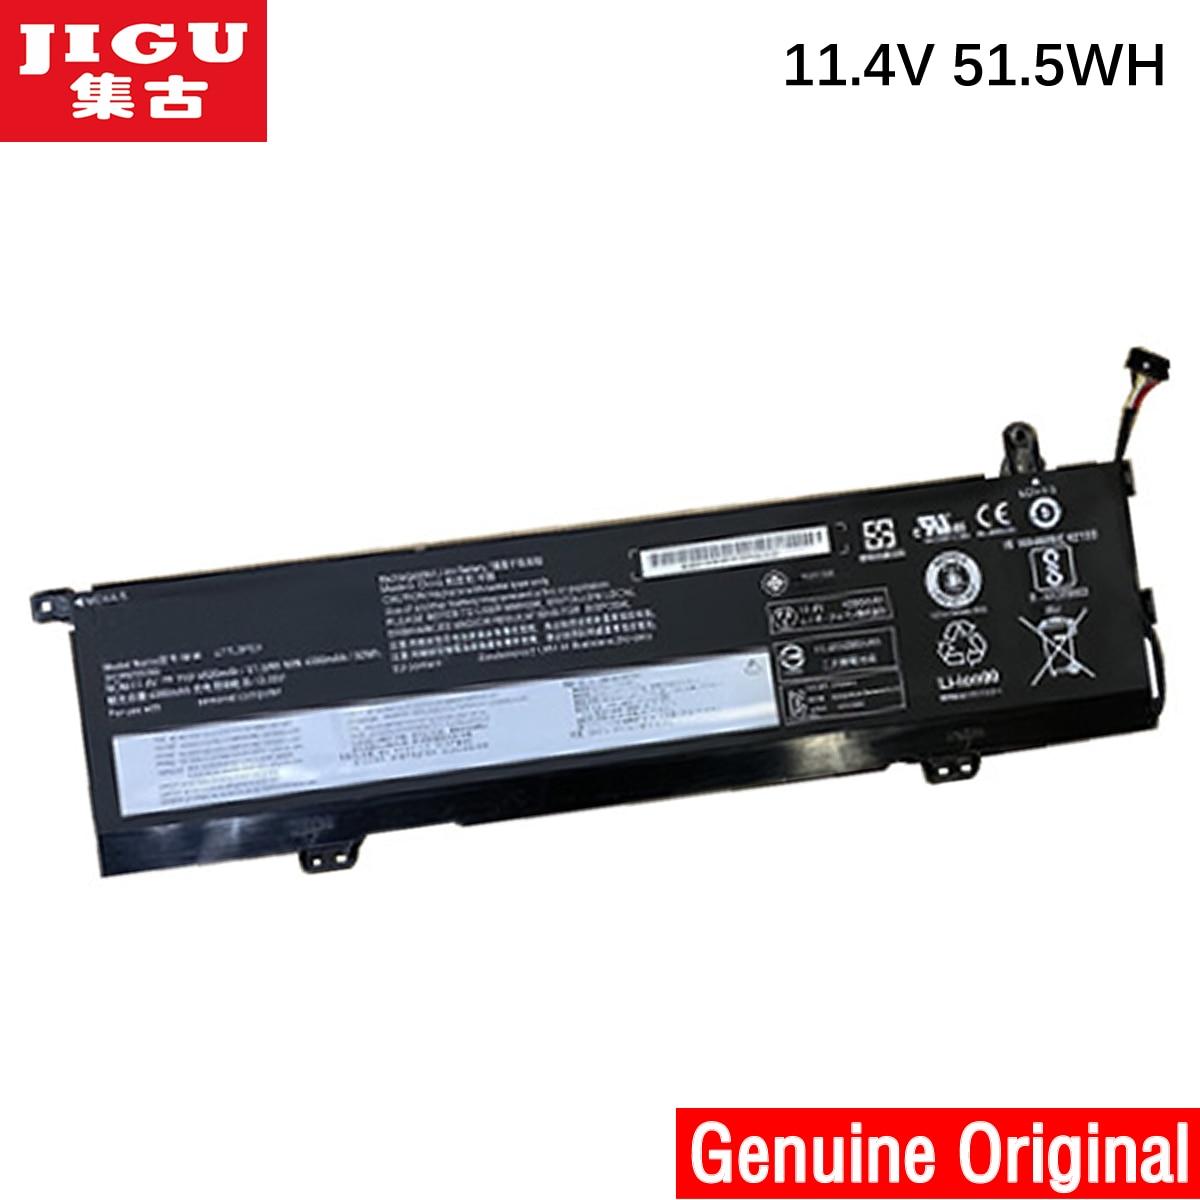 Оригинальный аккумулятор JIGU L17L3PE0 L17L3PEO для ноутбука LENOVO для Yoga 730-15IKB для Yoga 730-15IWL для Yoga 730-15IWL-81JS0022GE